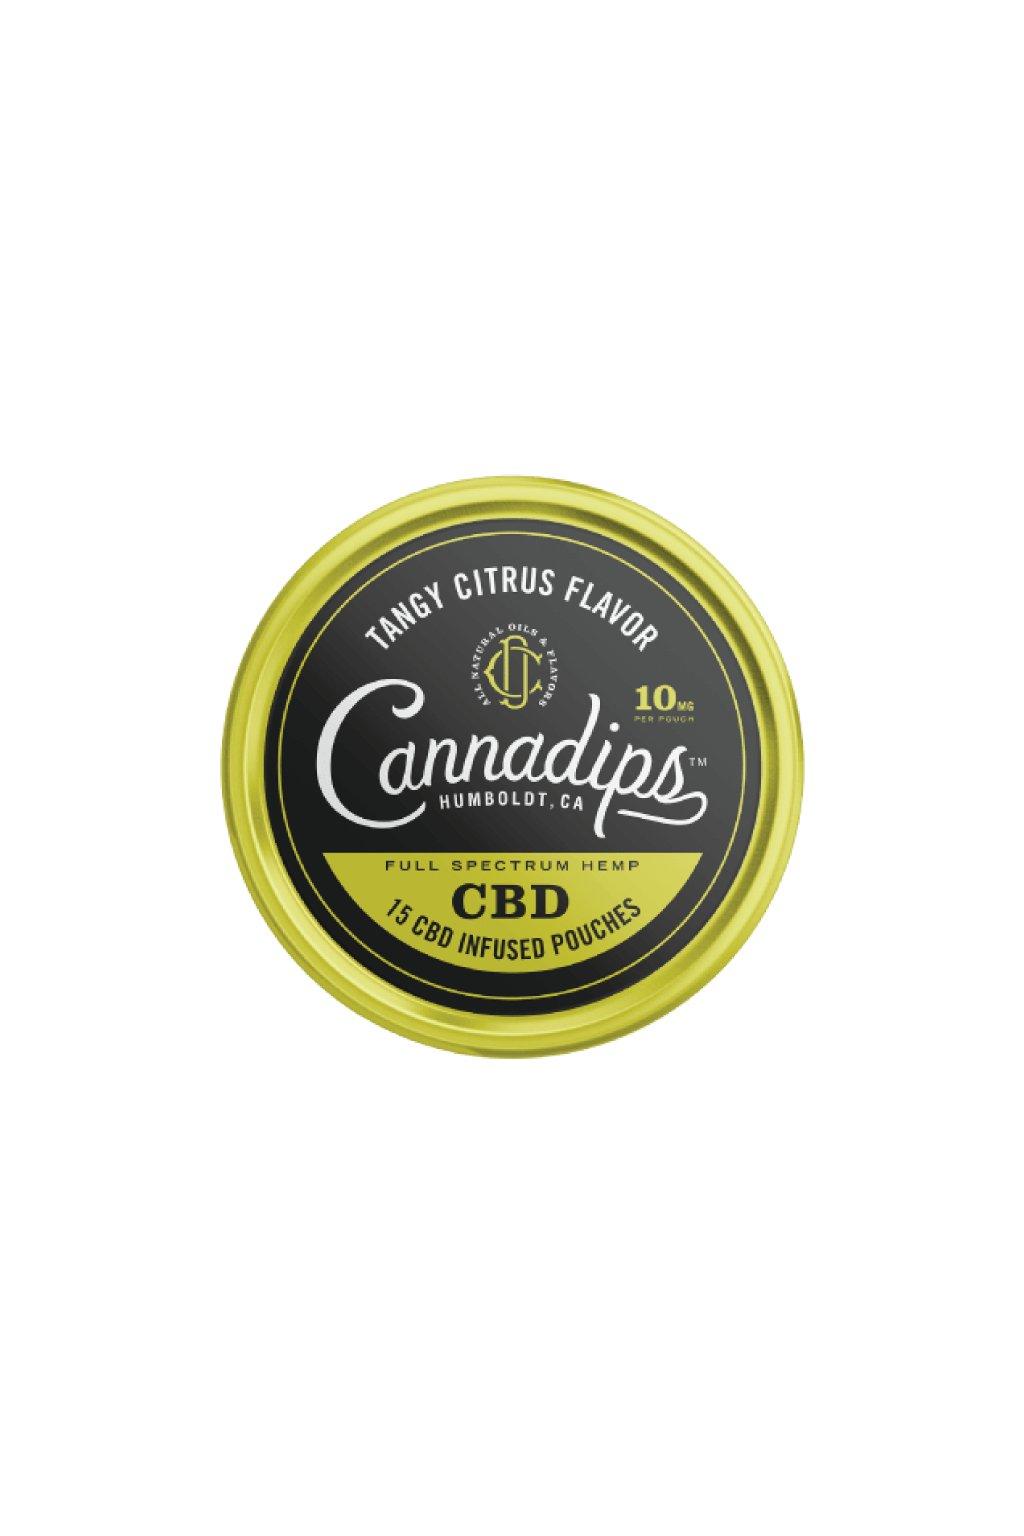 cannadips cbd sacky tangy citrus nordiction